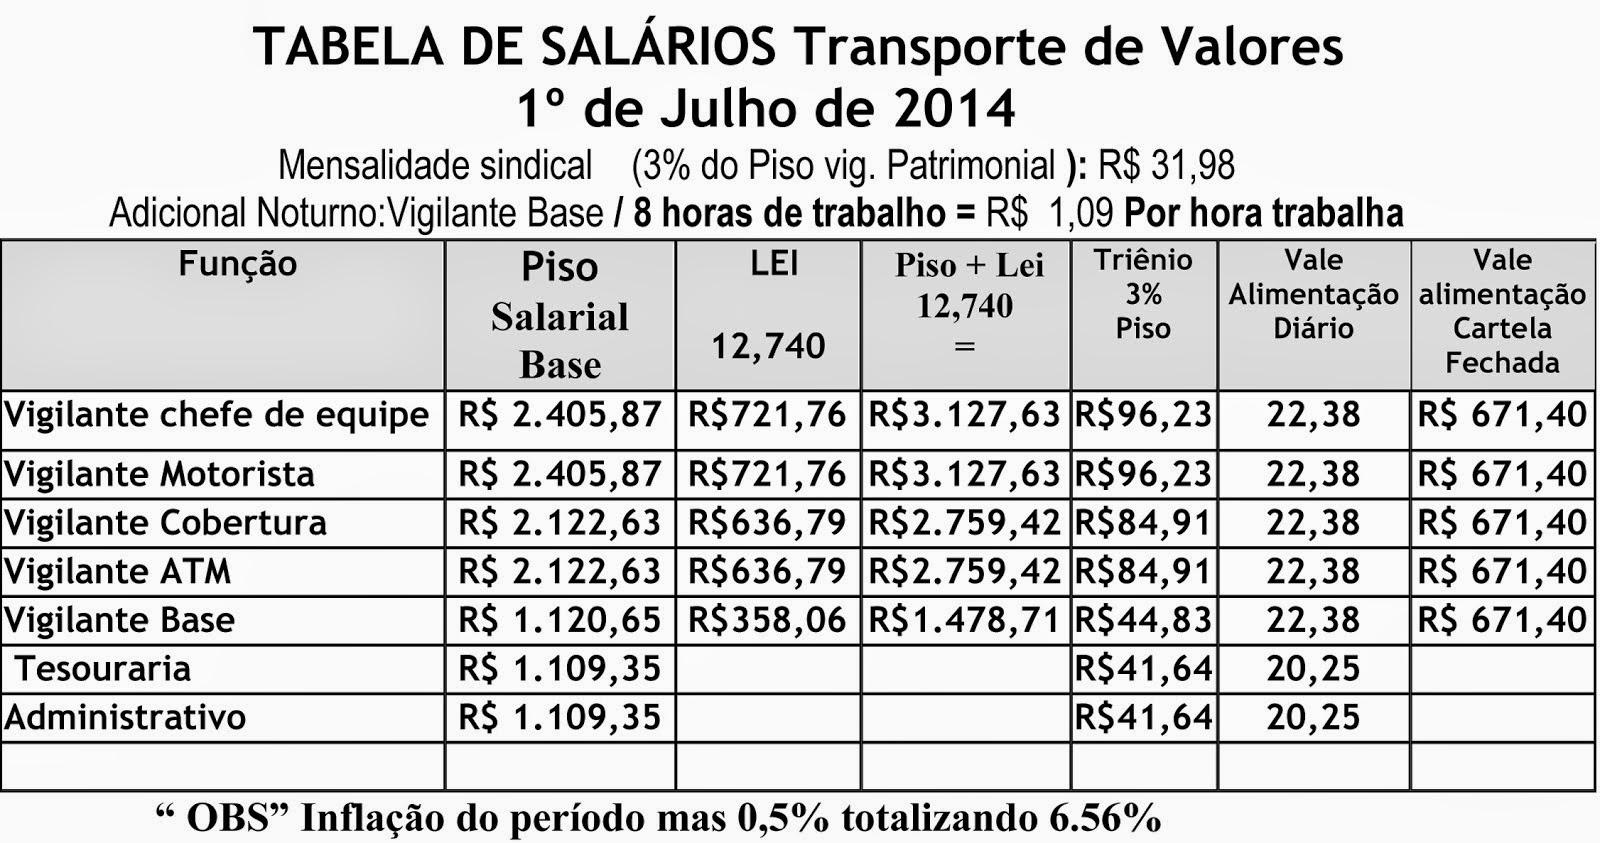 Tabela Salarial Transporte de Valores